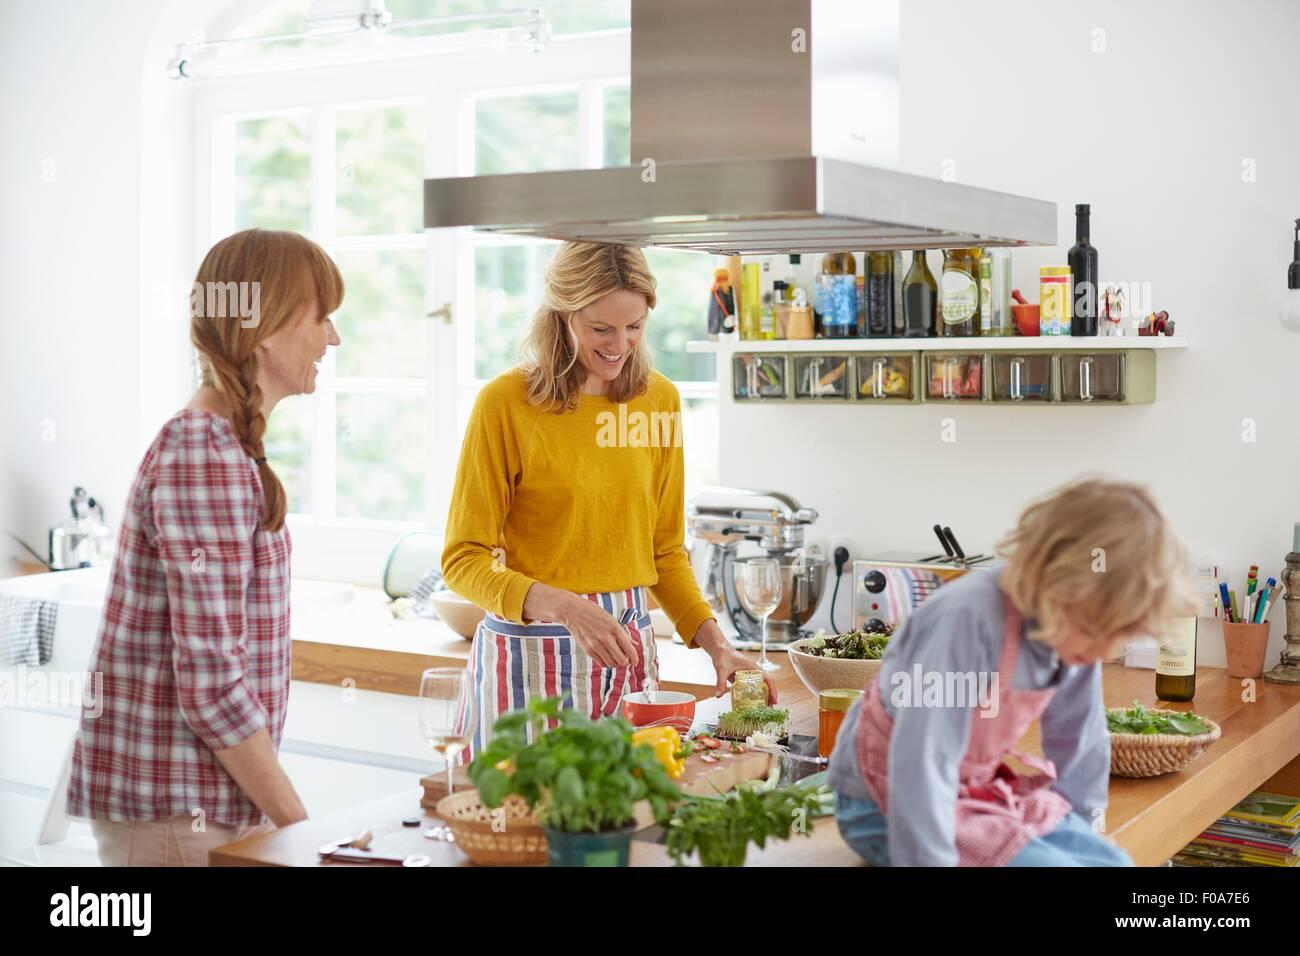 Women preparing meal in kitchen - Stock Image